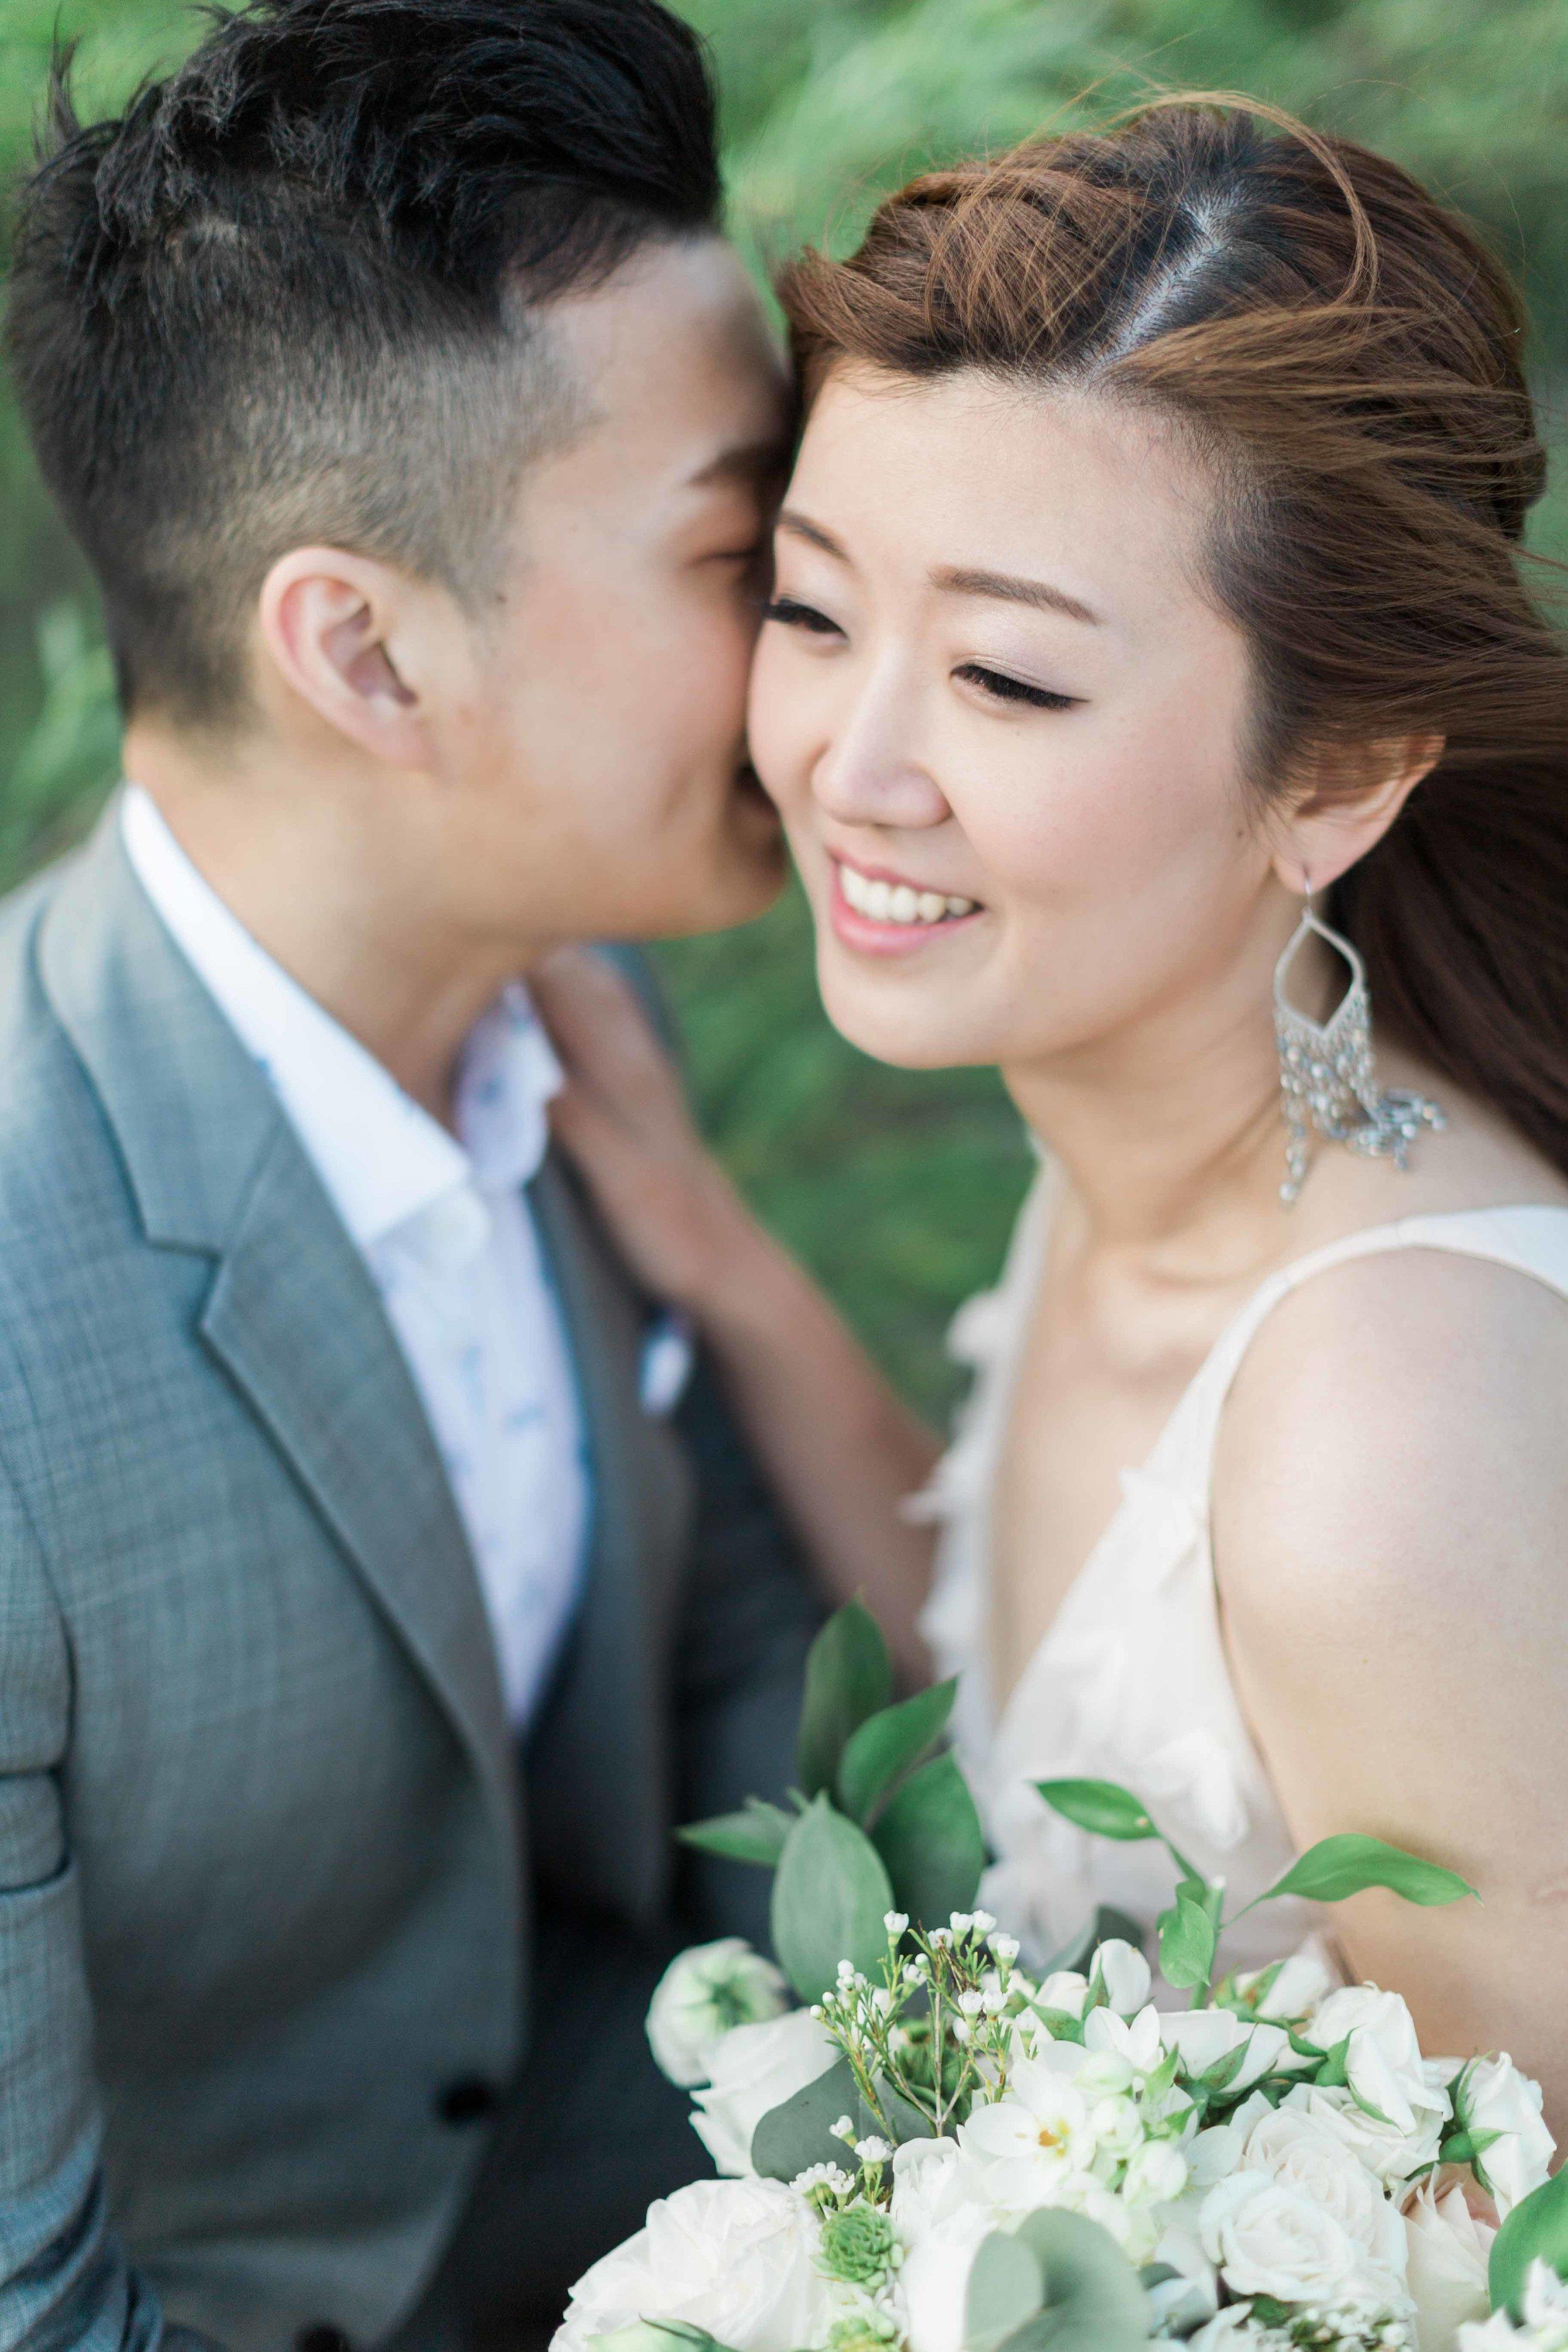 Cari Zhu Fine Art Photographer - Scarborough Bluffs Engagement Session-14.jpg